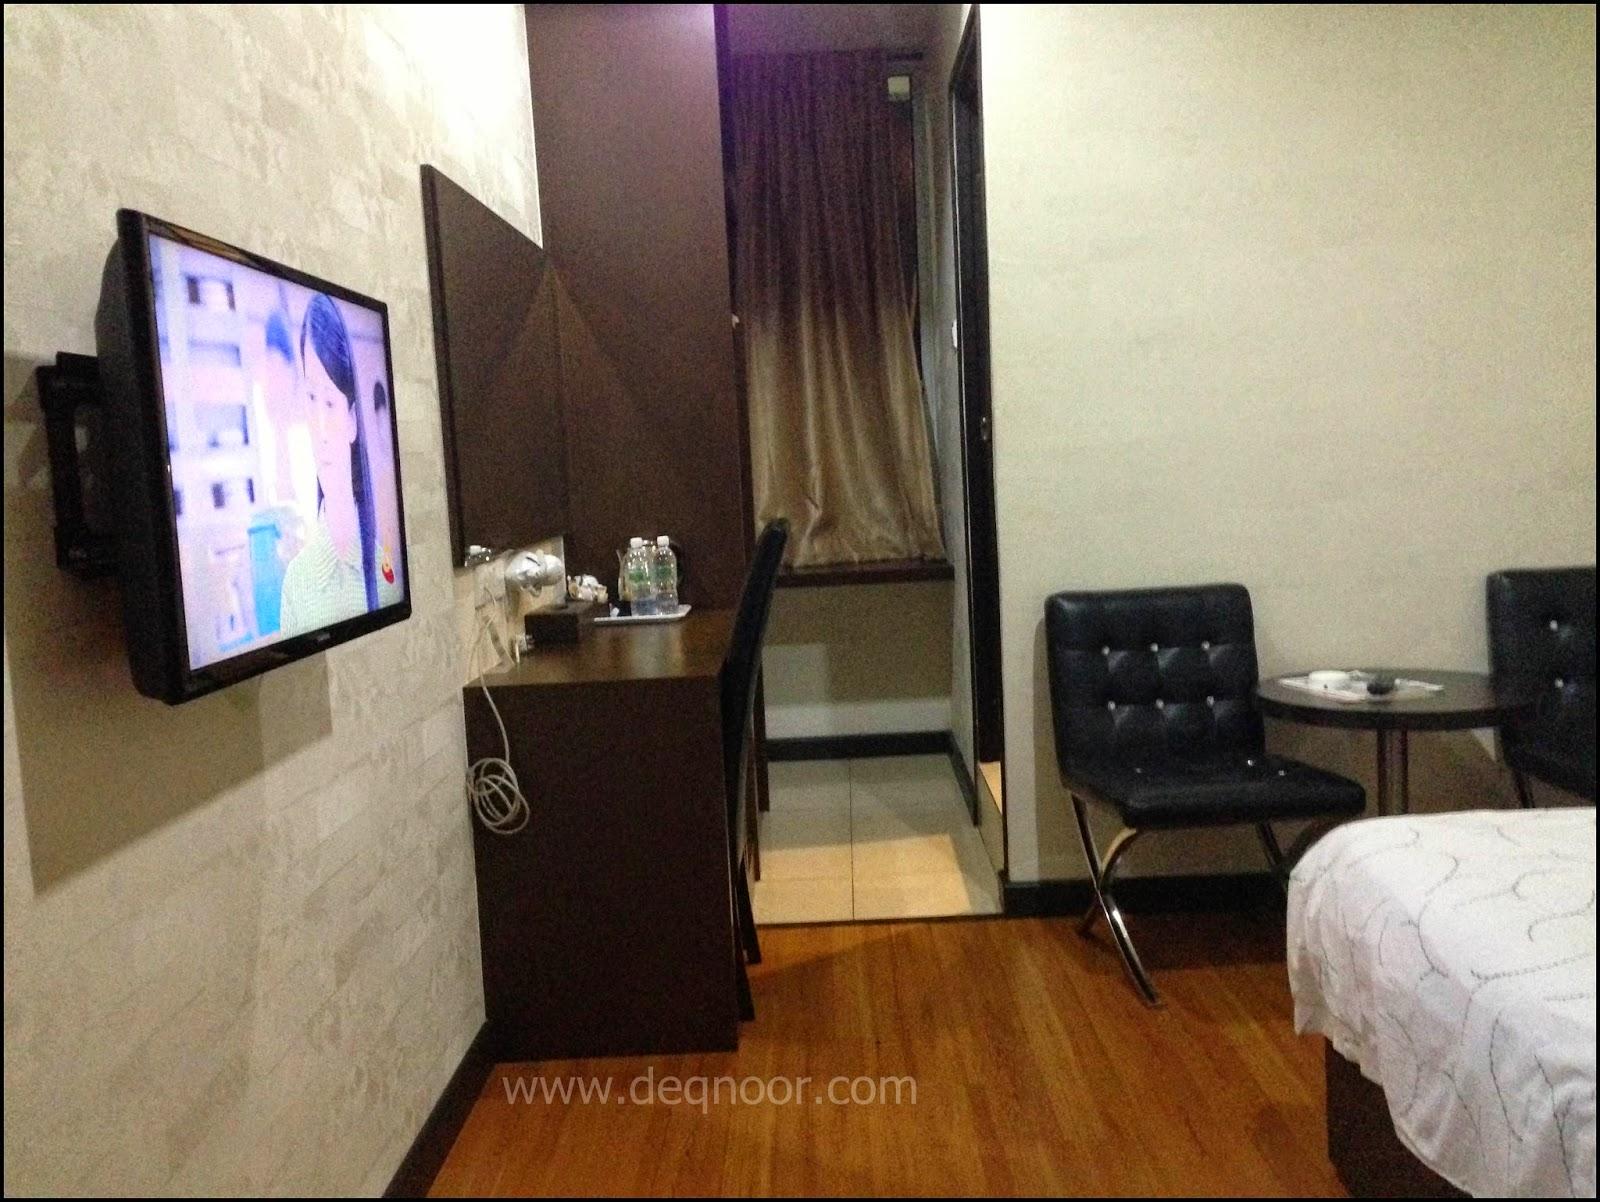 Inilah Kemudahan Lain Yang Ada Di Dalam Bilik Superior King Tv Dengan Pelbagai Channel Astro Serta Singapore Tray Dijadikan Sebagai Ruang Pantry